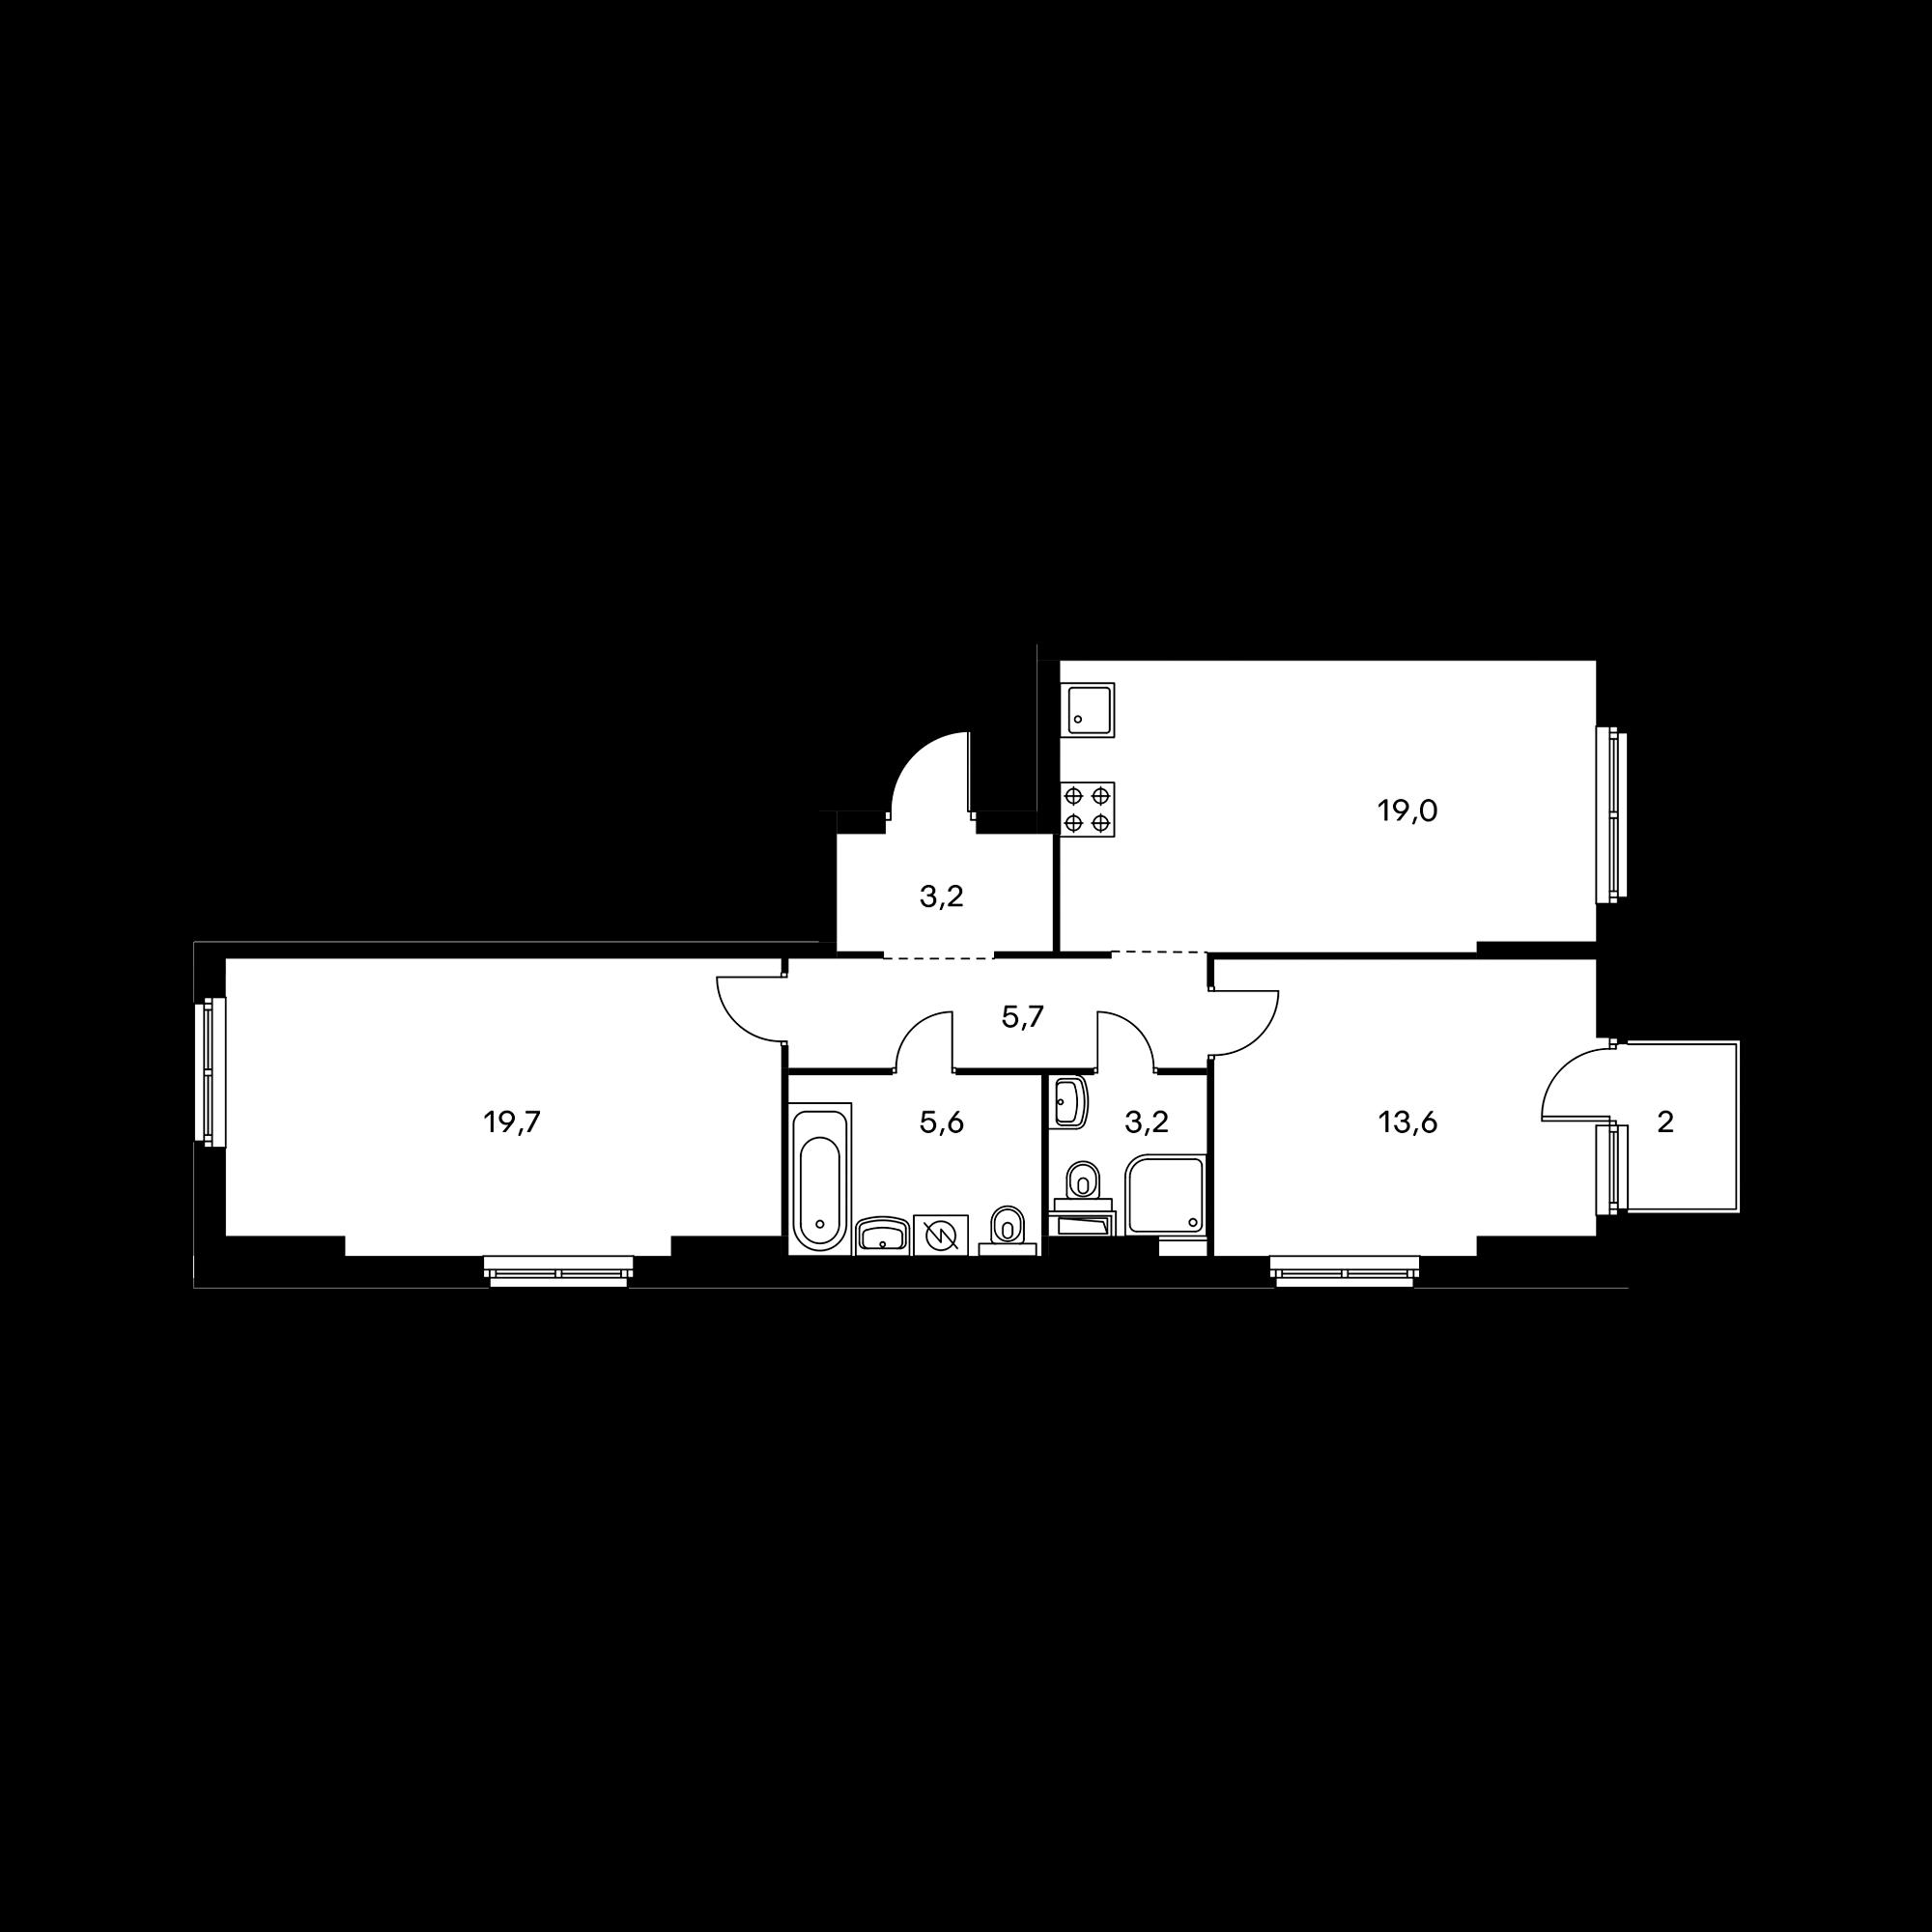 2EL3_6.6-1TB1